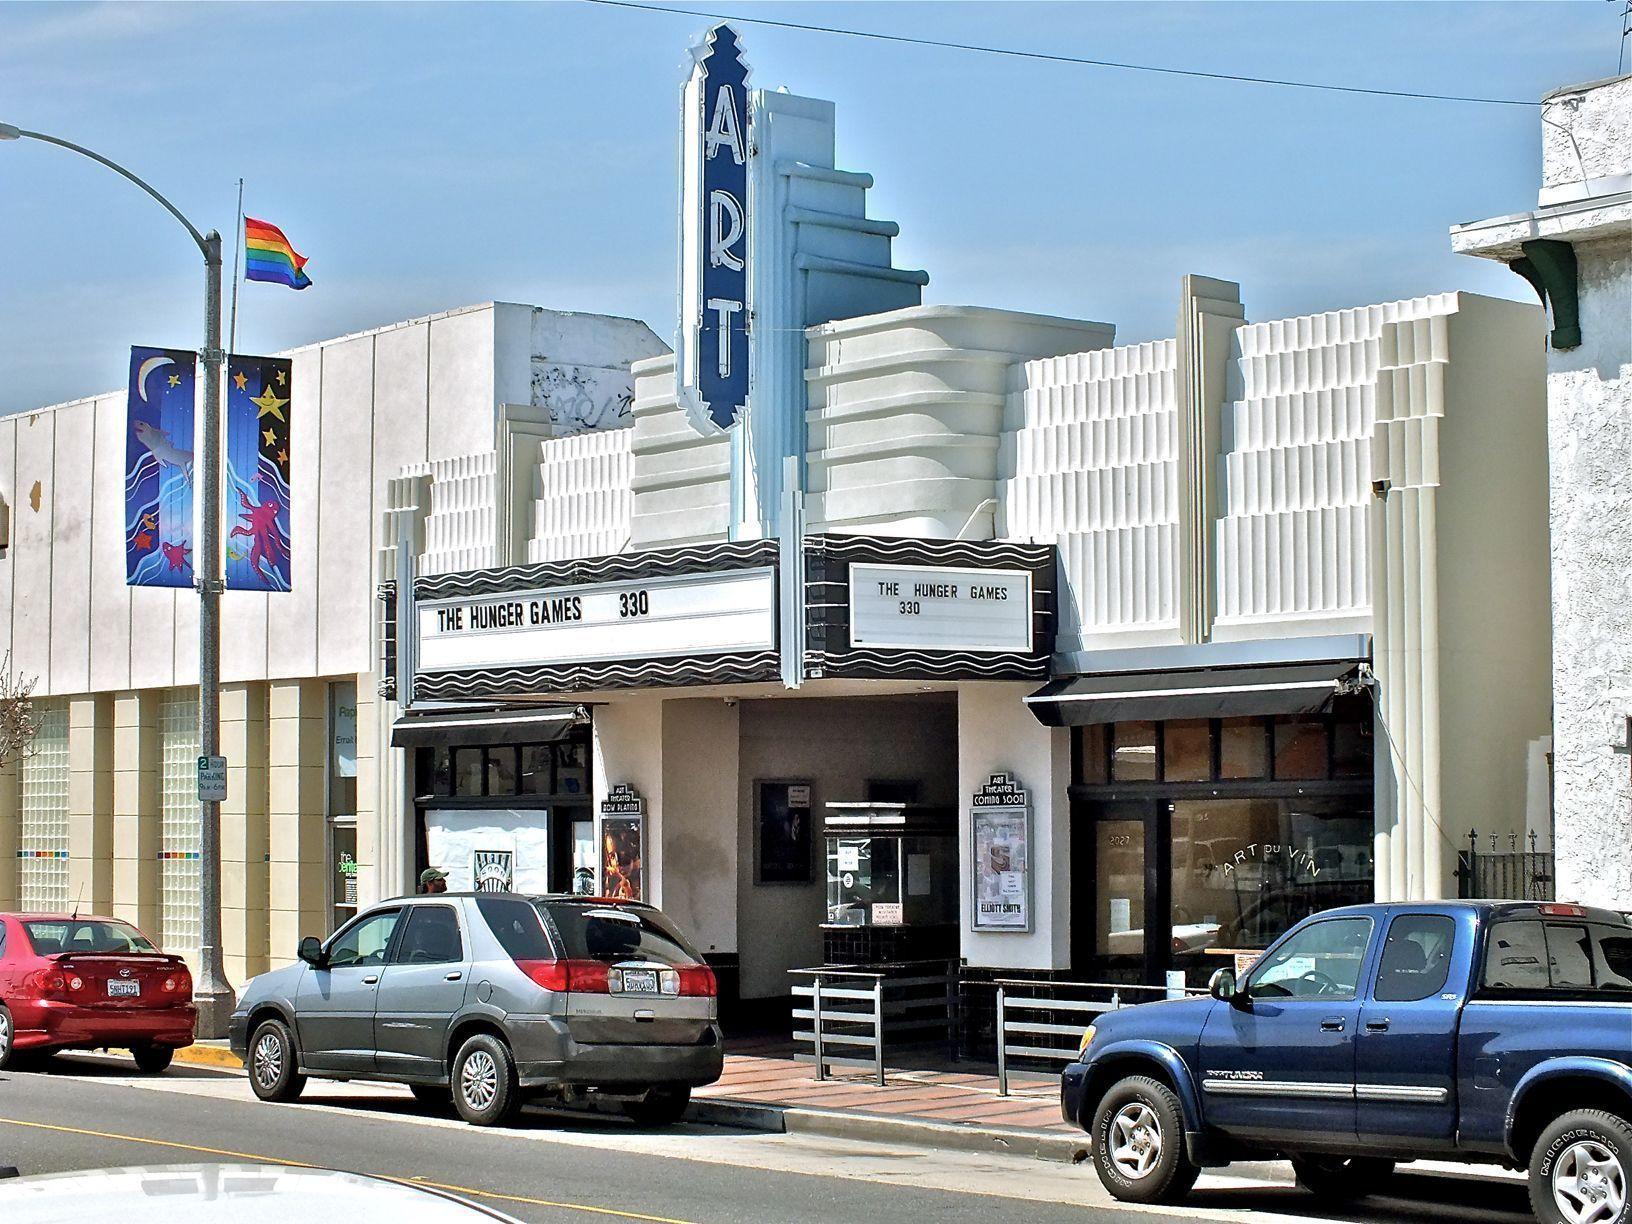 4th Street Retro Row, Long Beach, CA - ShowMeHome.com